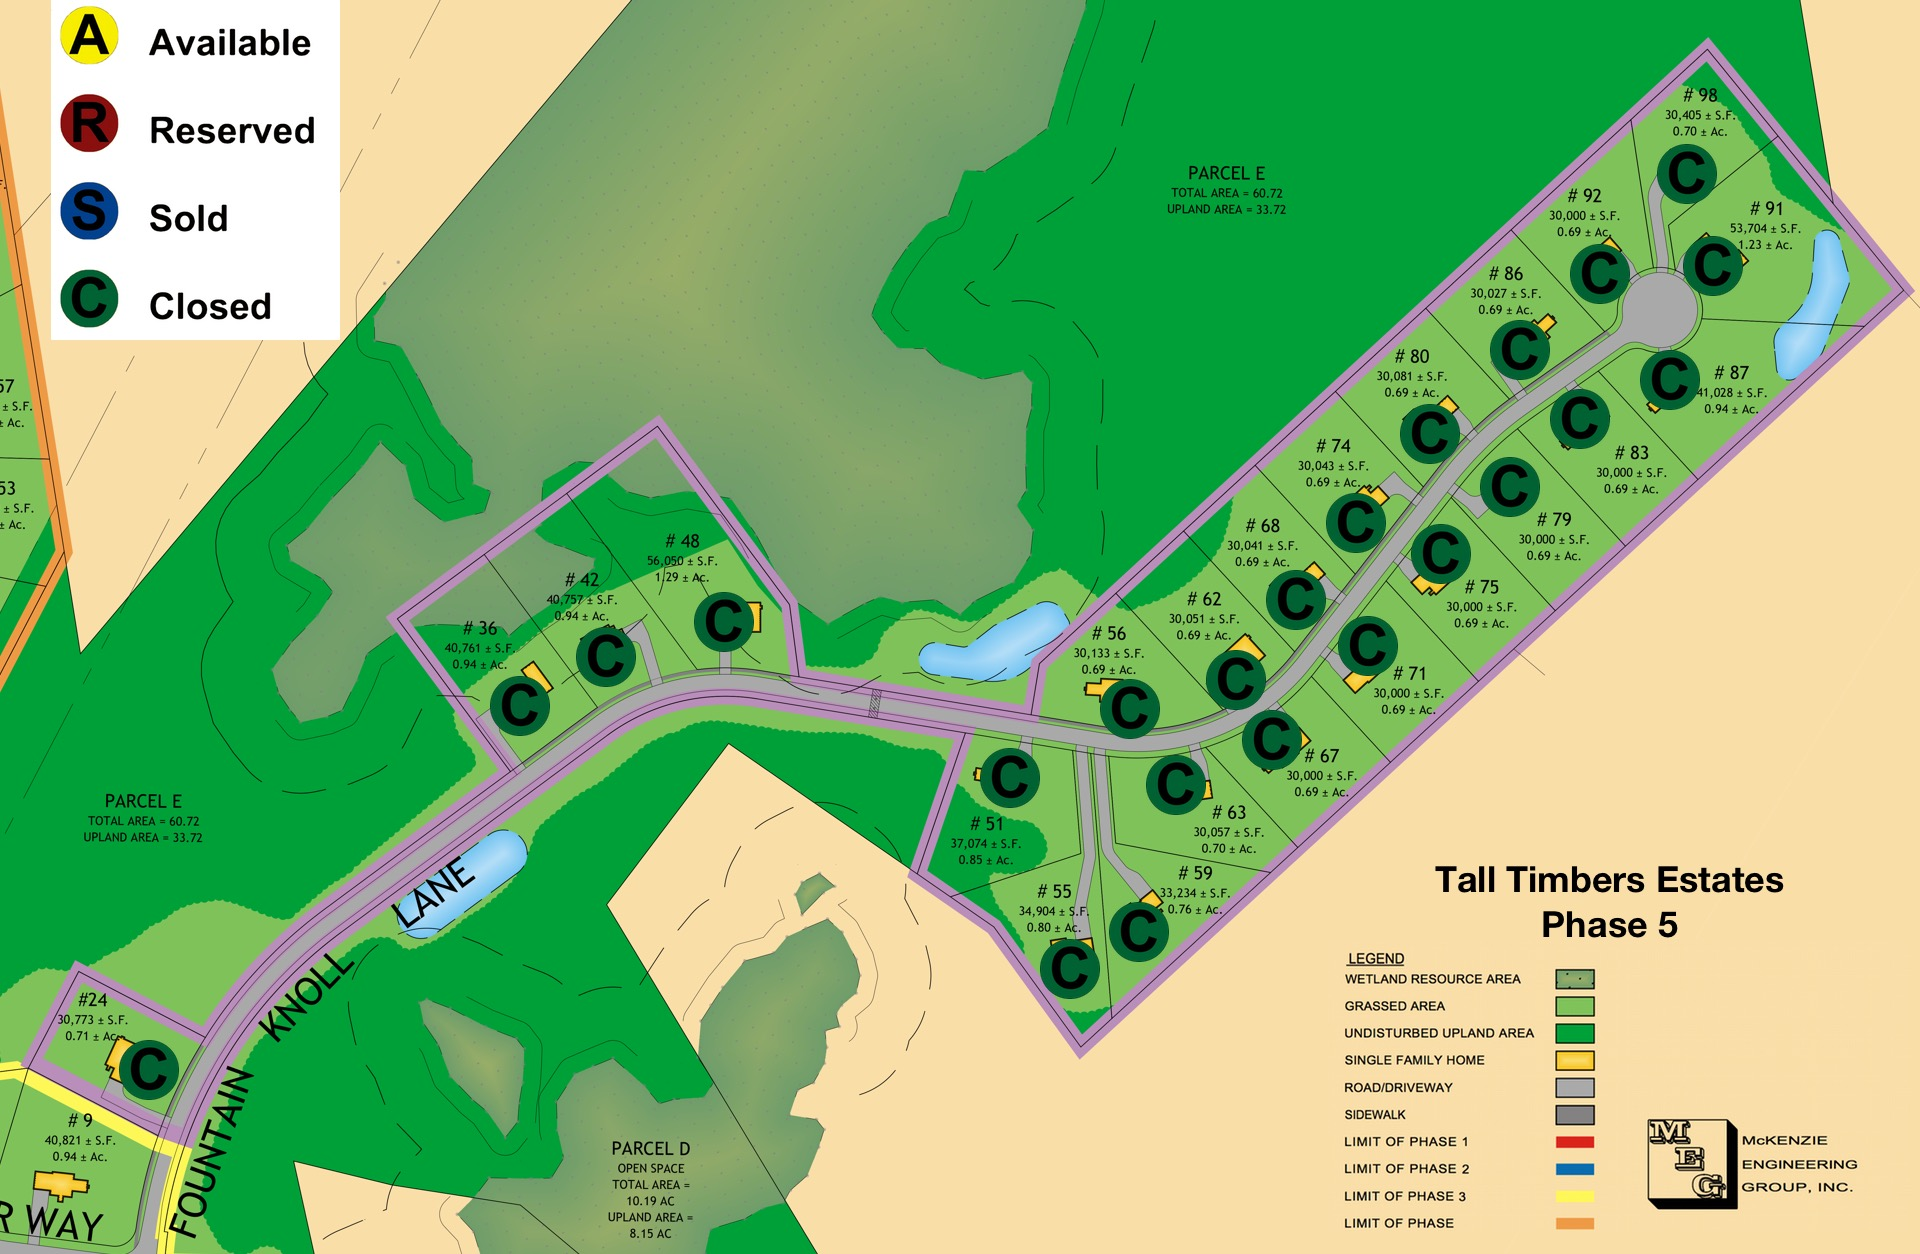 2018-03-28 - Phase 5 Reservation Plan.jpg